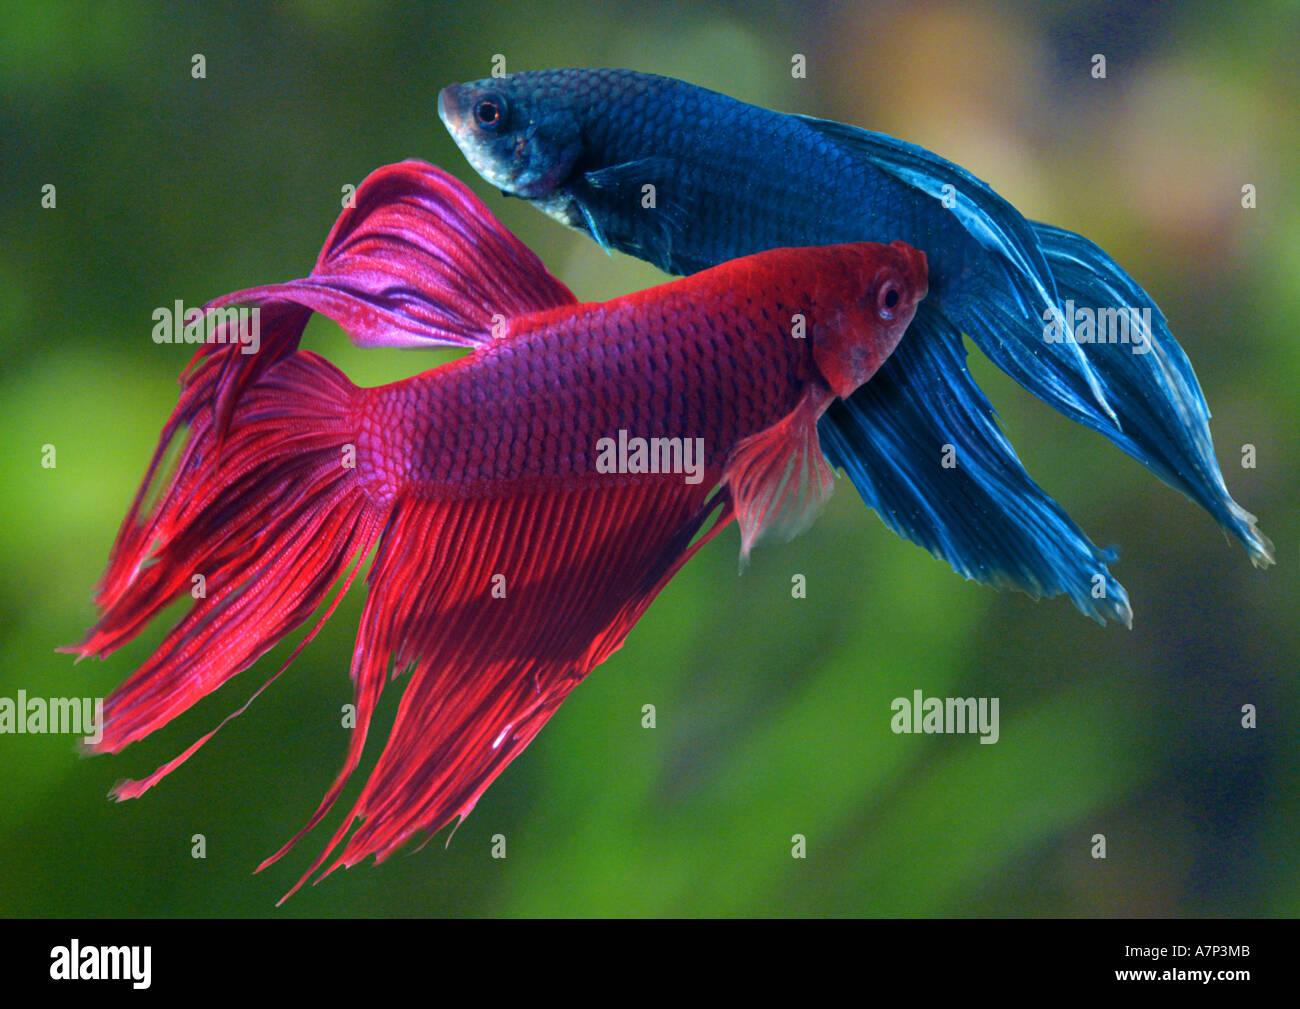 Siamese Fighting Fish Betta Splendens Fighting Males Stock Photo